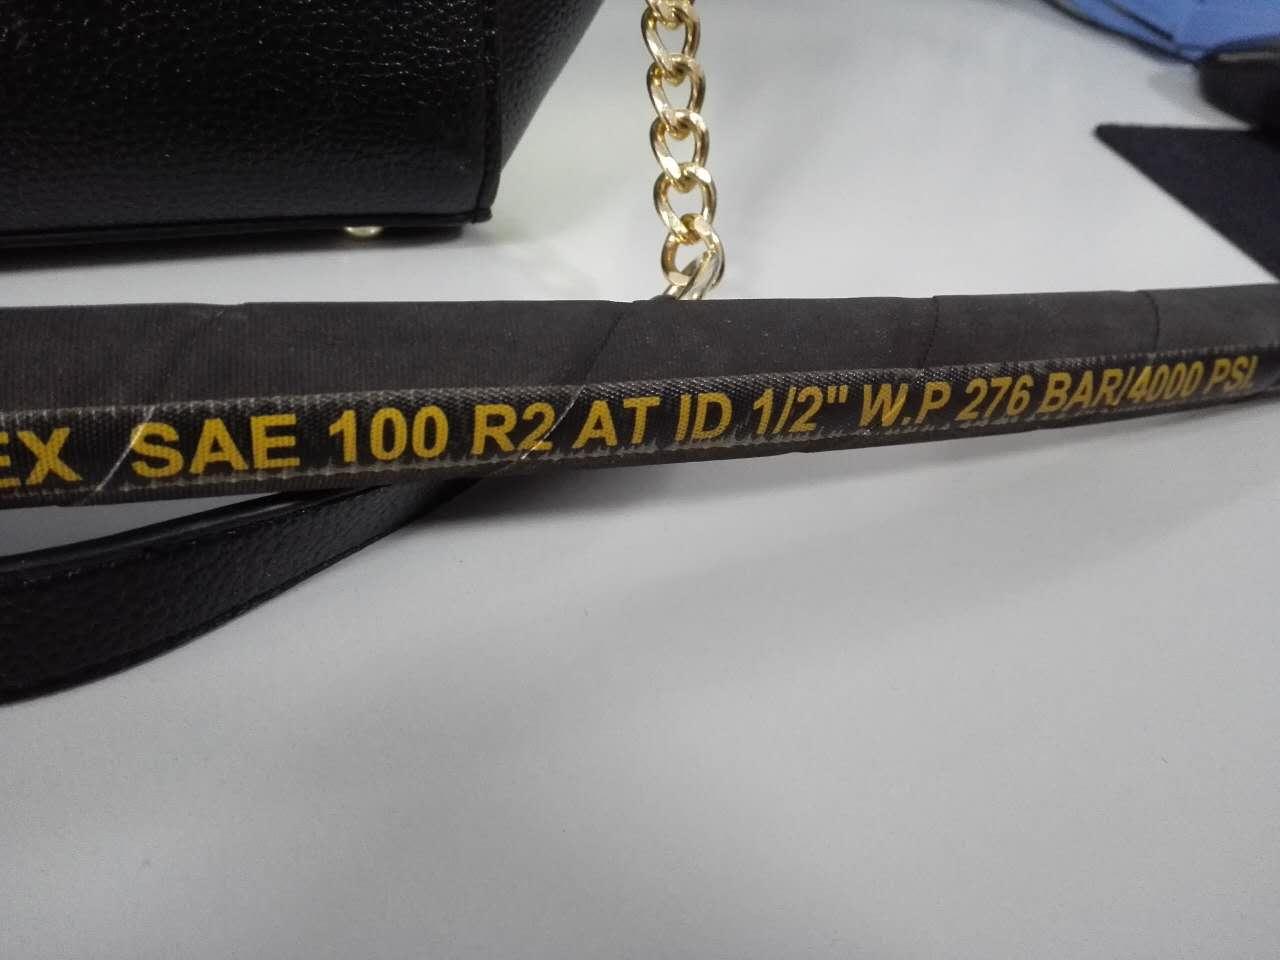 SAE 100 R2